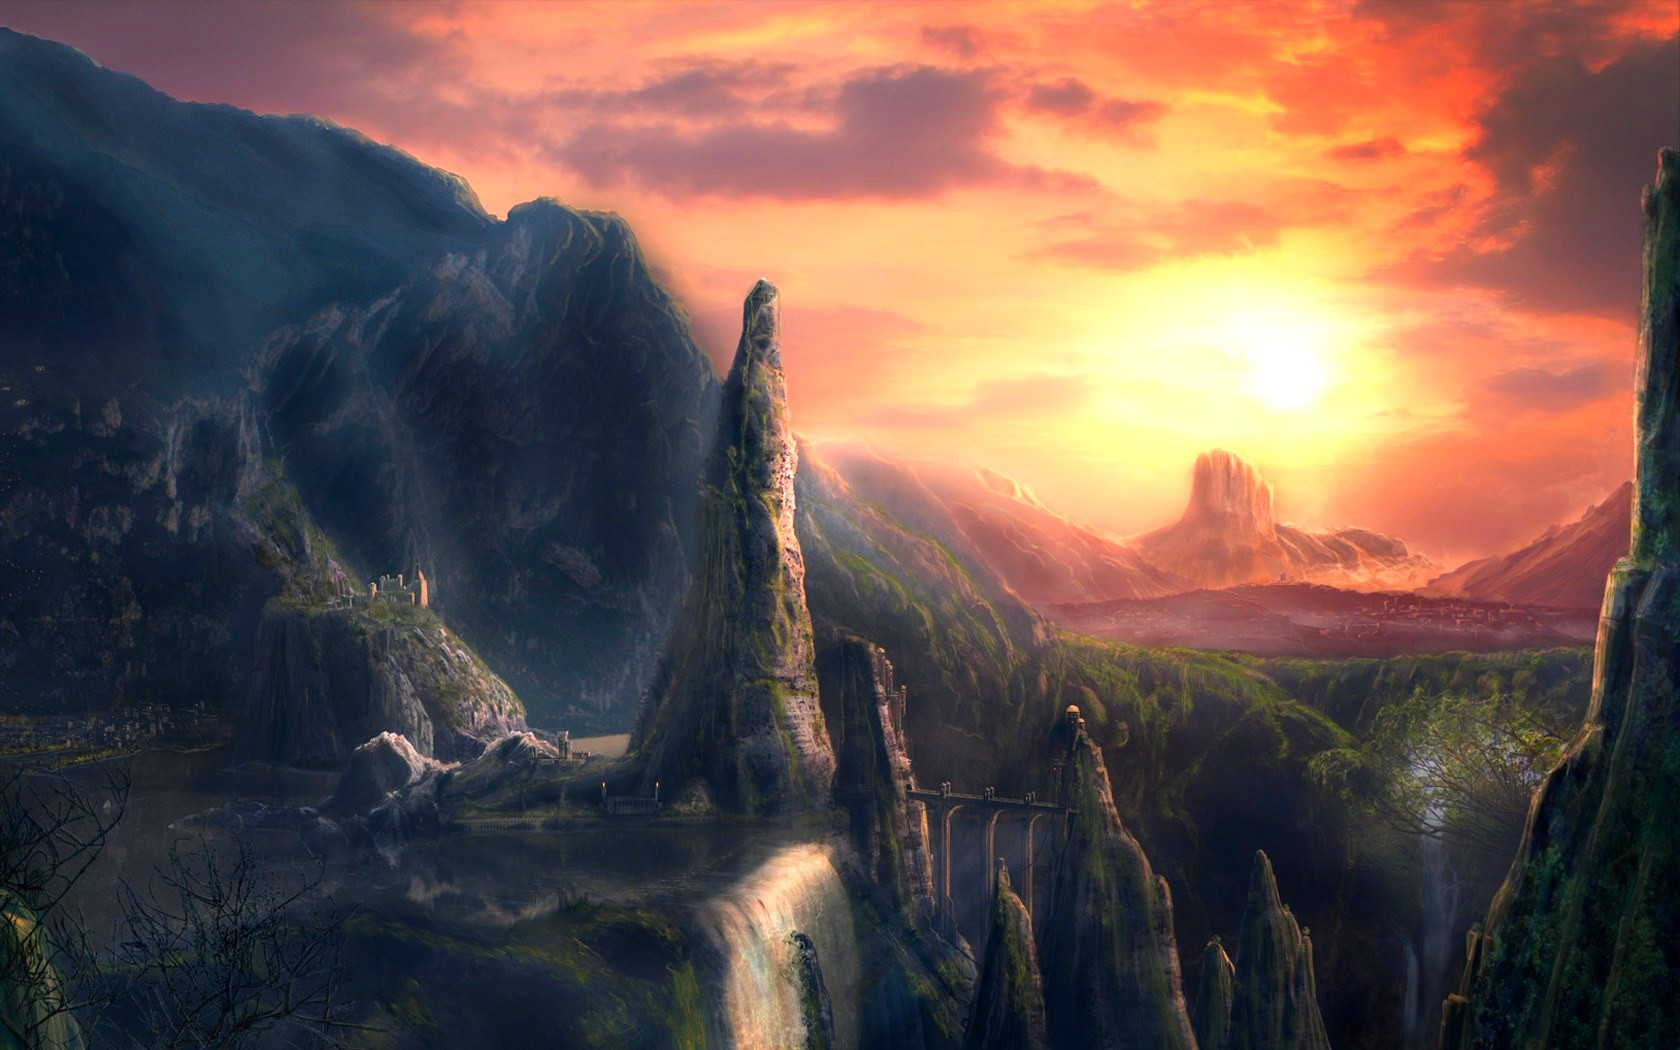 fantasy, Landscape, Art, Artwork, Nature, Scenery